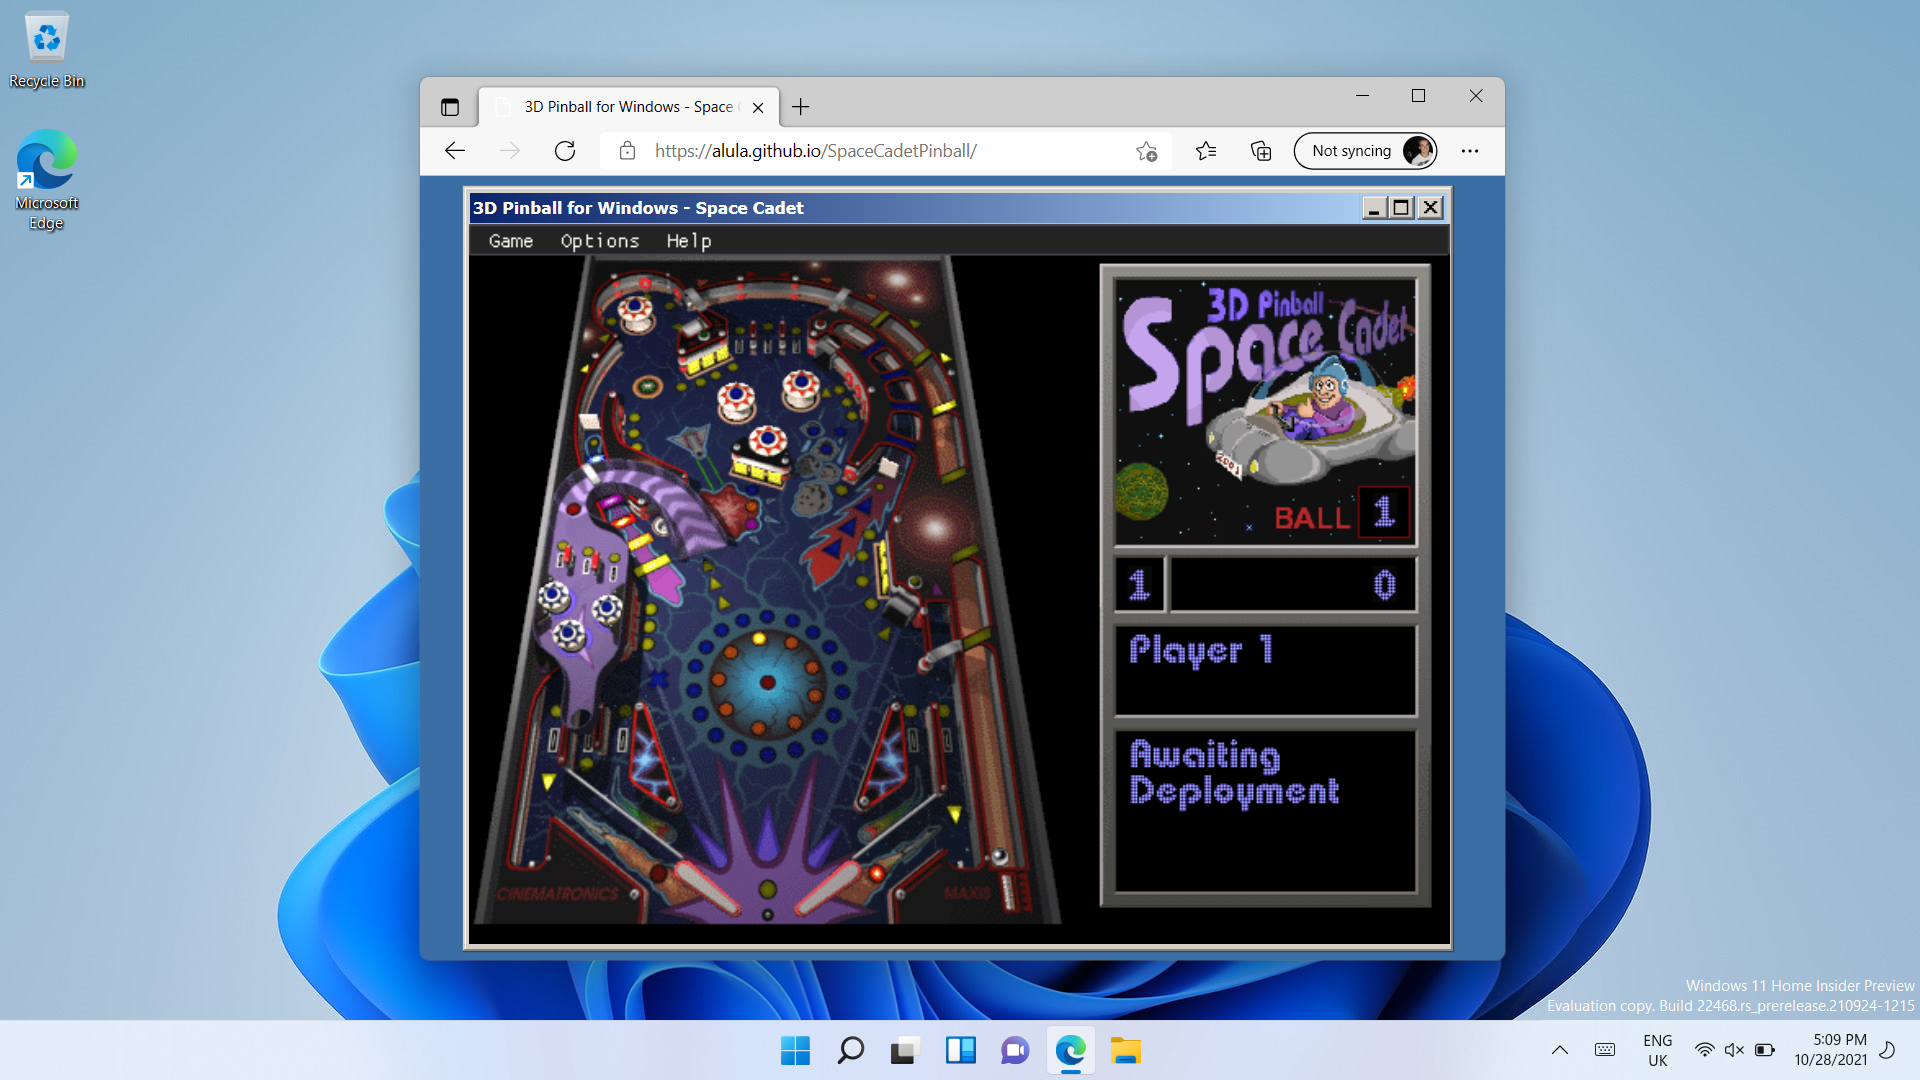 3D Pinball running in Edge browser, in Windows 11